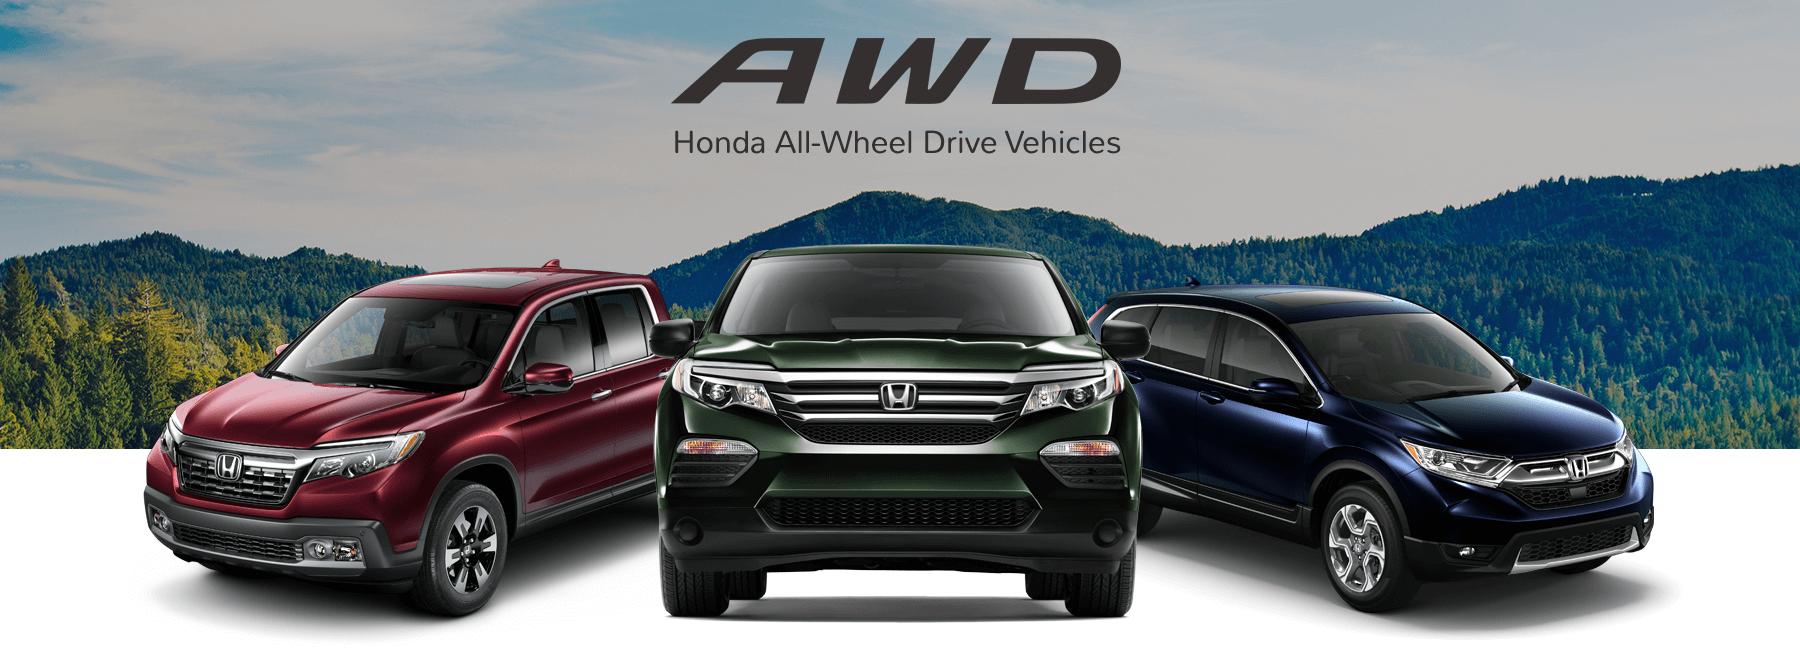 Honda All-Wheel Drive Vehicles